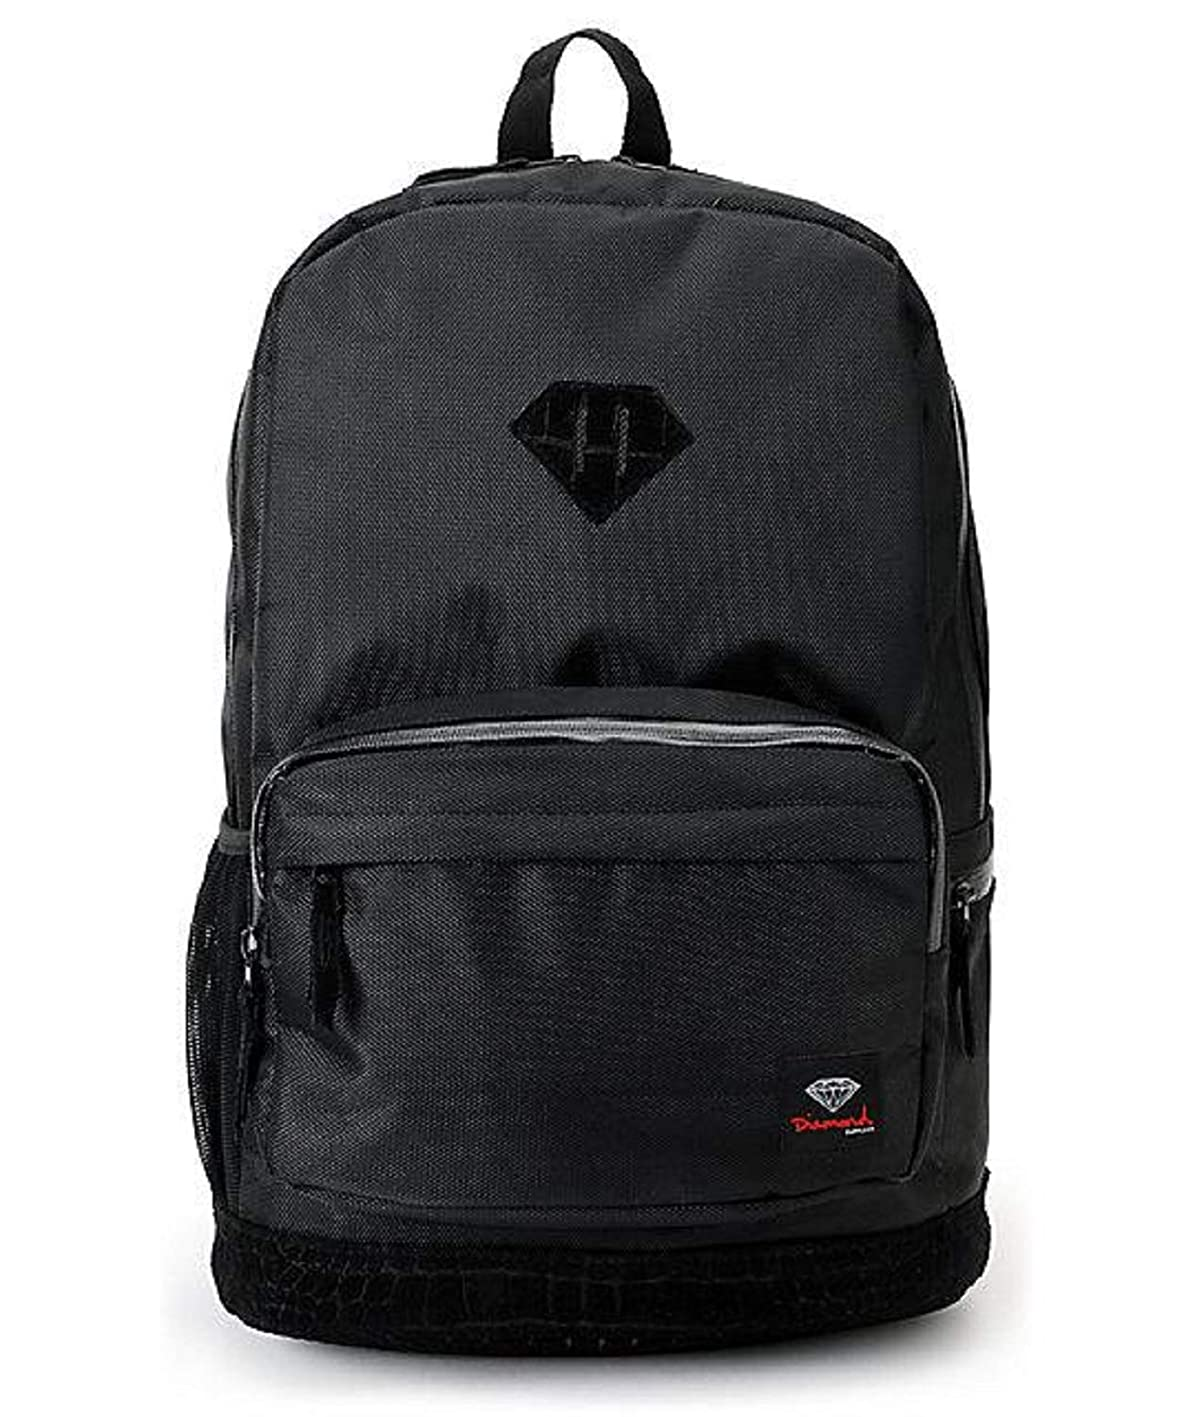 Diamond Supply Co Croc School Life Backpack Skateboarding Travel Bag gsewonavvct153